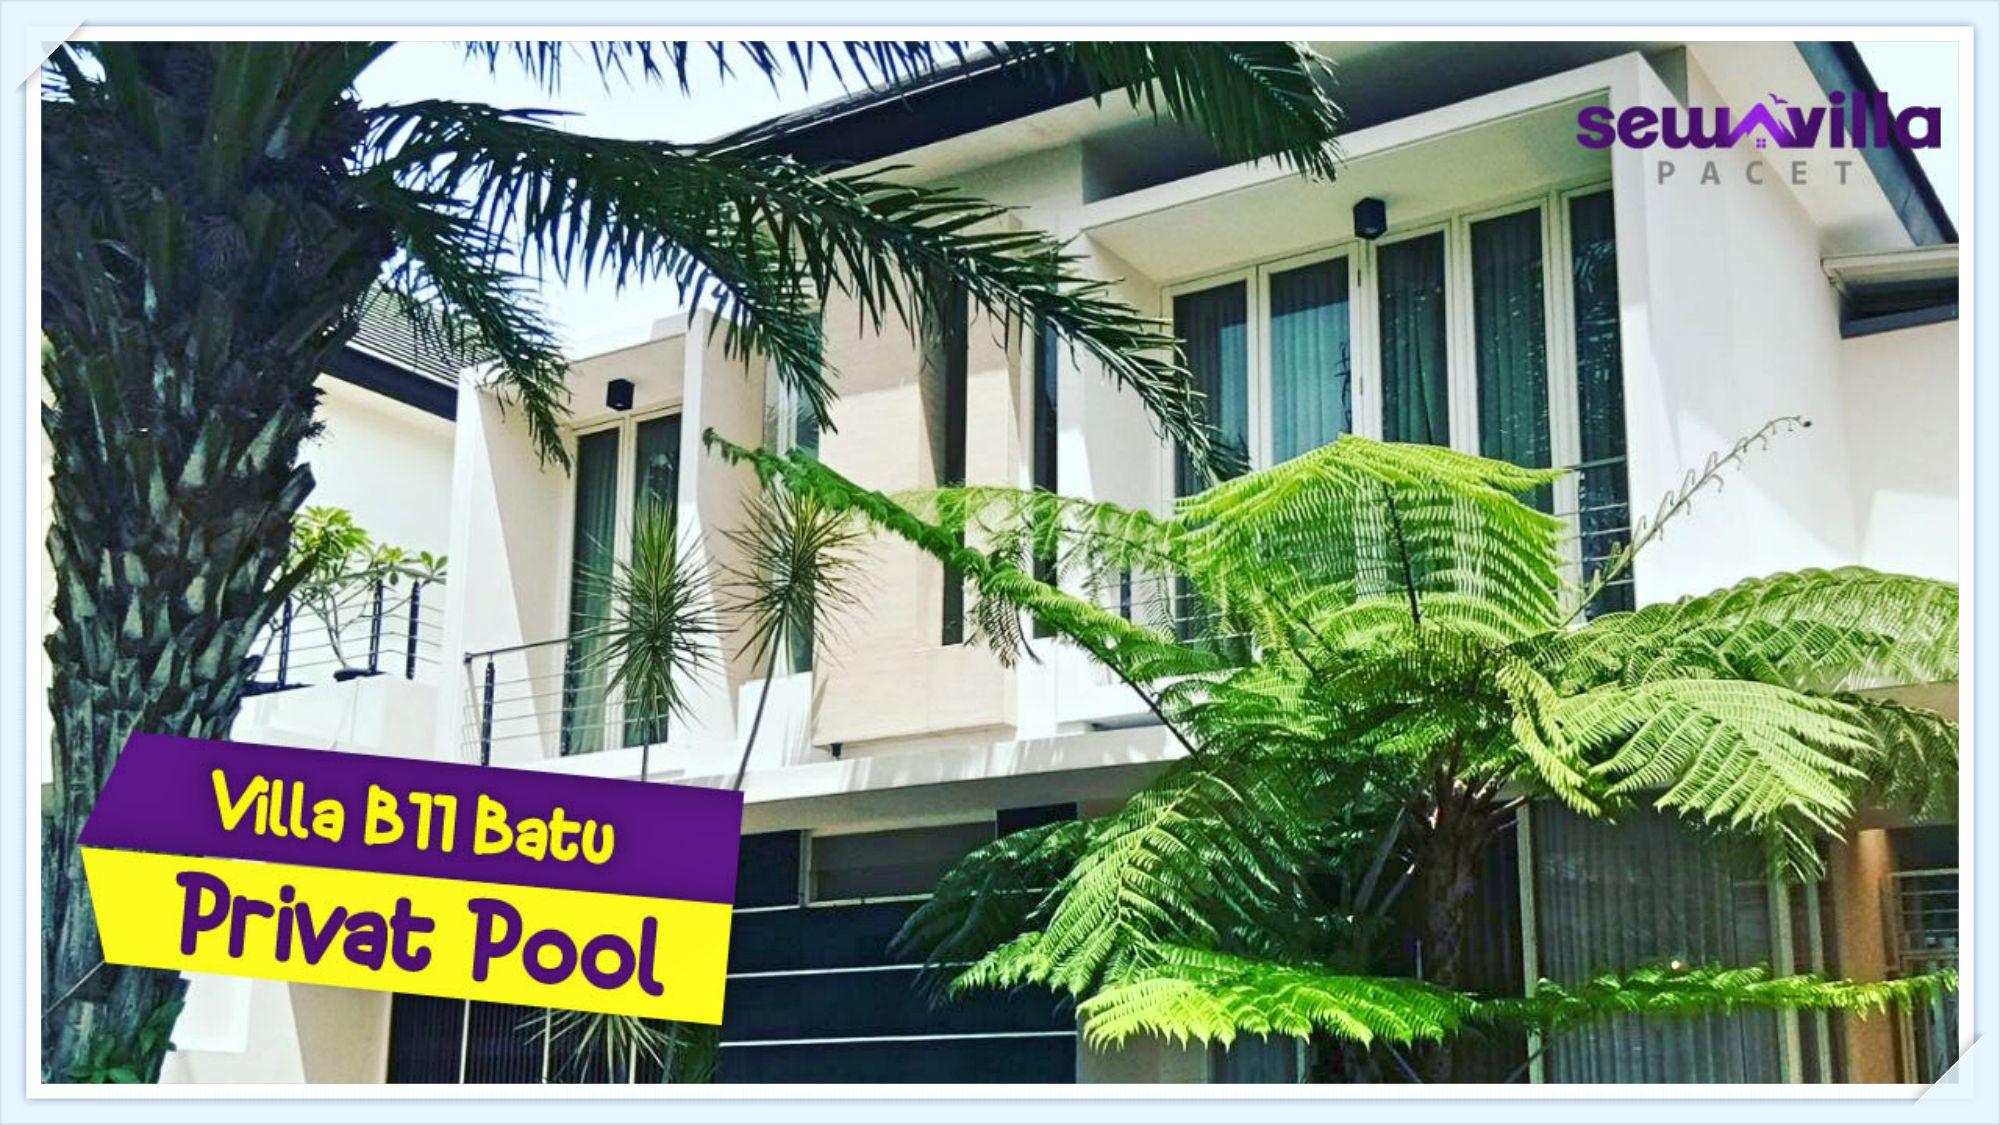 villa b11 batu modern mewah fasilitas lengkap